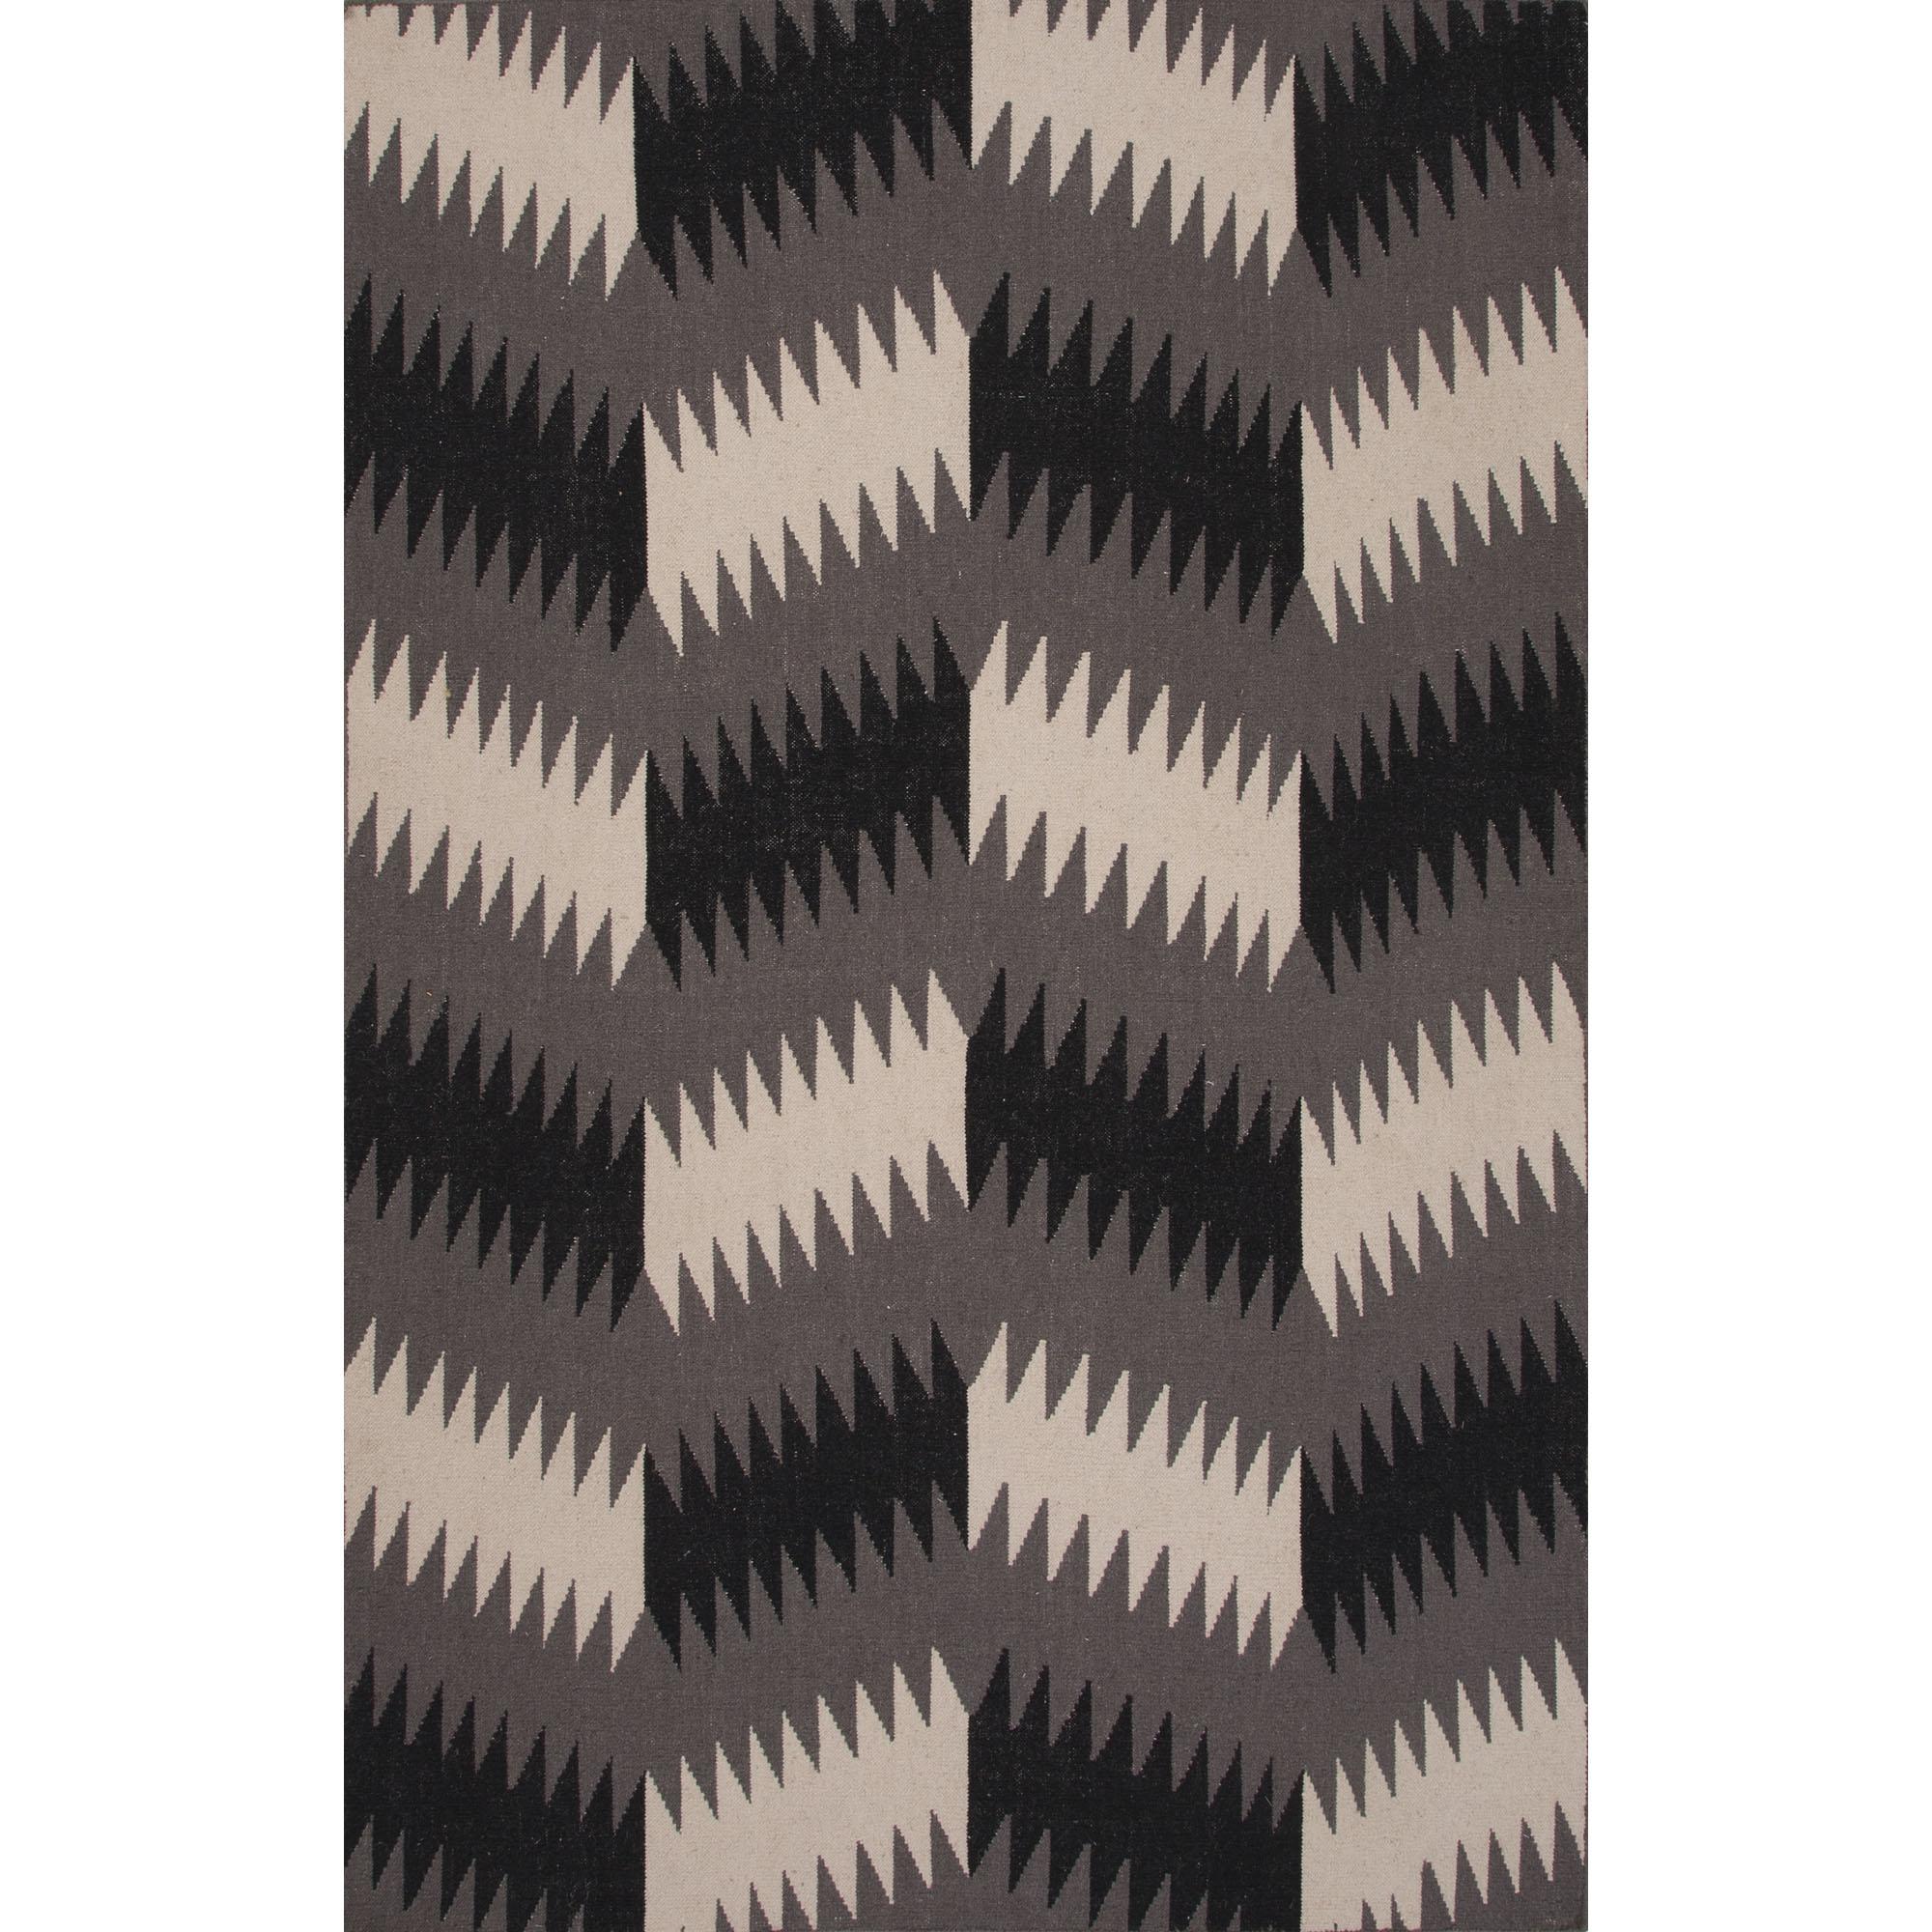 JAIPUR Rugs Traditions Modern Flat Weave 2 x 3 Rug - Item Number: RUG122823